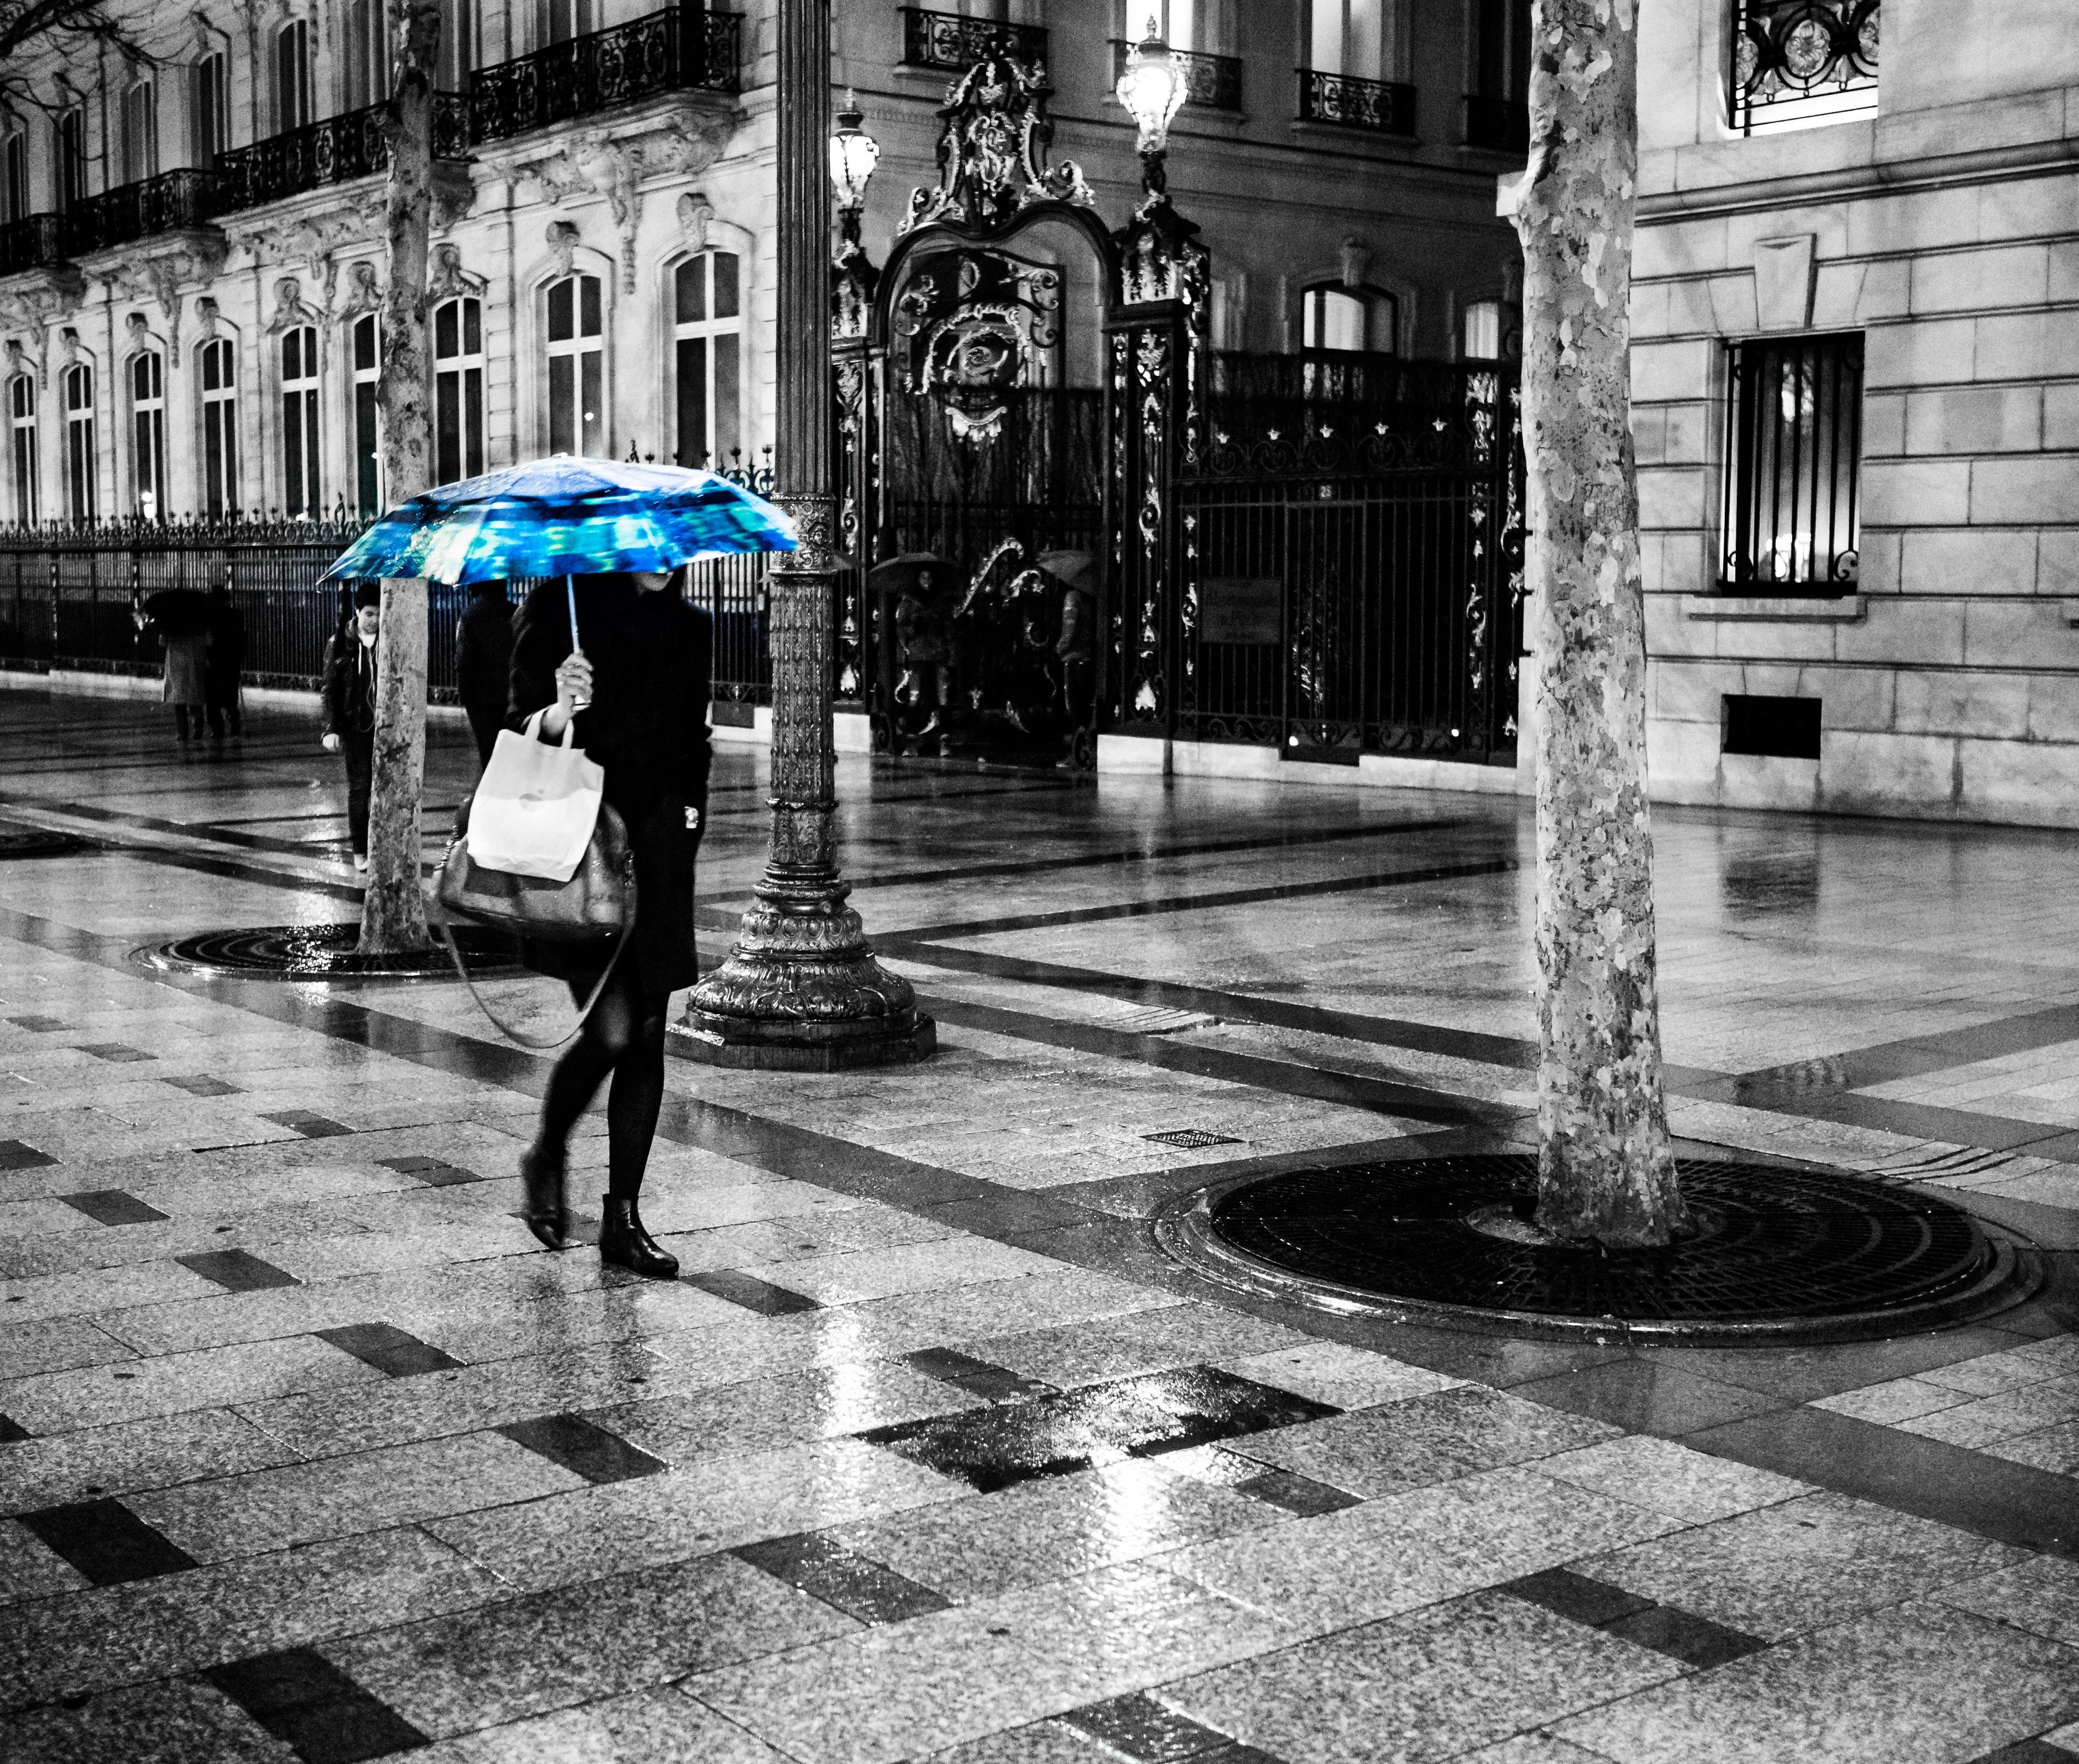 Wallpaper Street Blue Bw Woman White Black Paris France Girl Rain Night Umbrella Walking Noir Champs Pluie Nb Bleu Desaturation Rue Nuit Blanc Marche Partial Elysees Prapluie 3949x3351 811059 Hd Wallpapers Wallhere